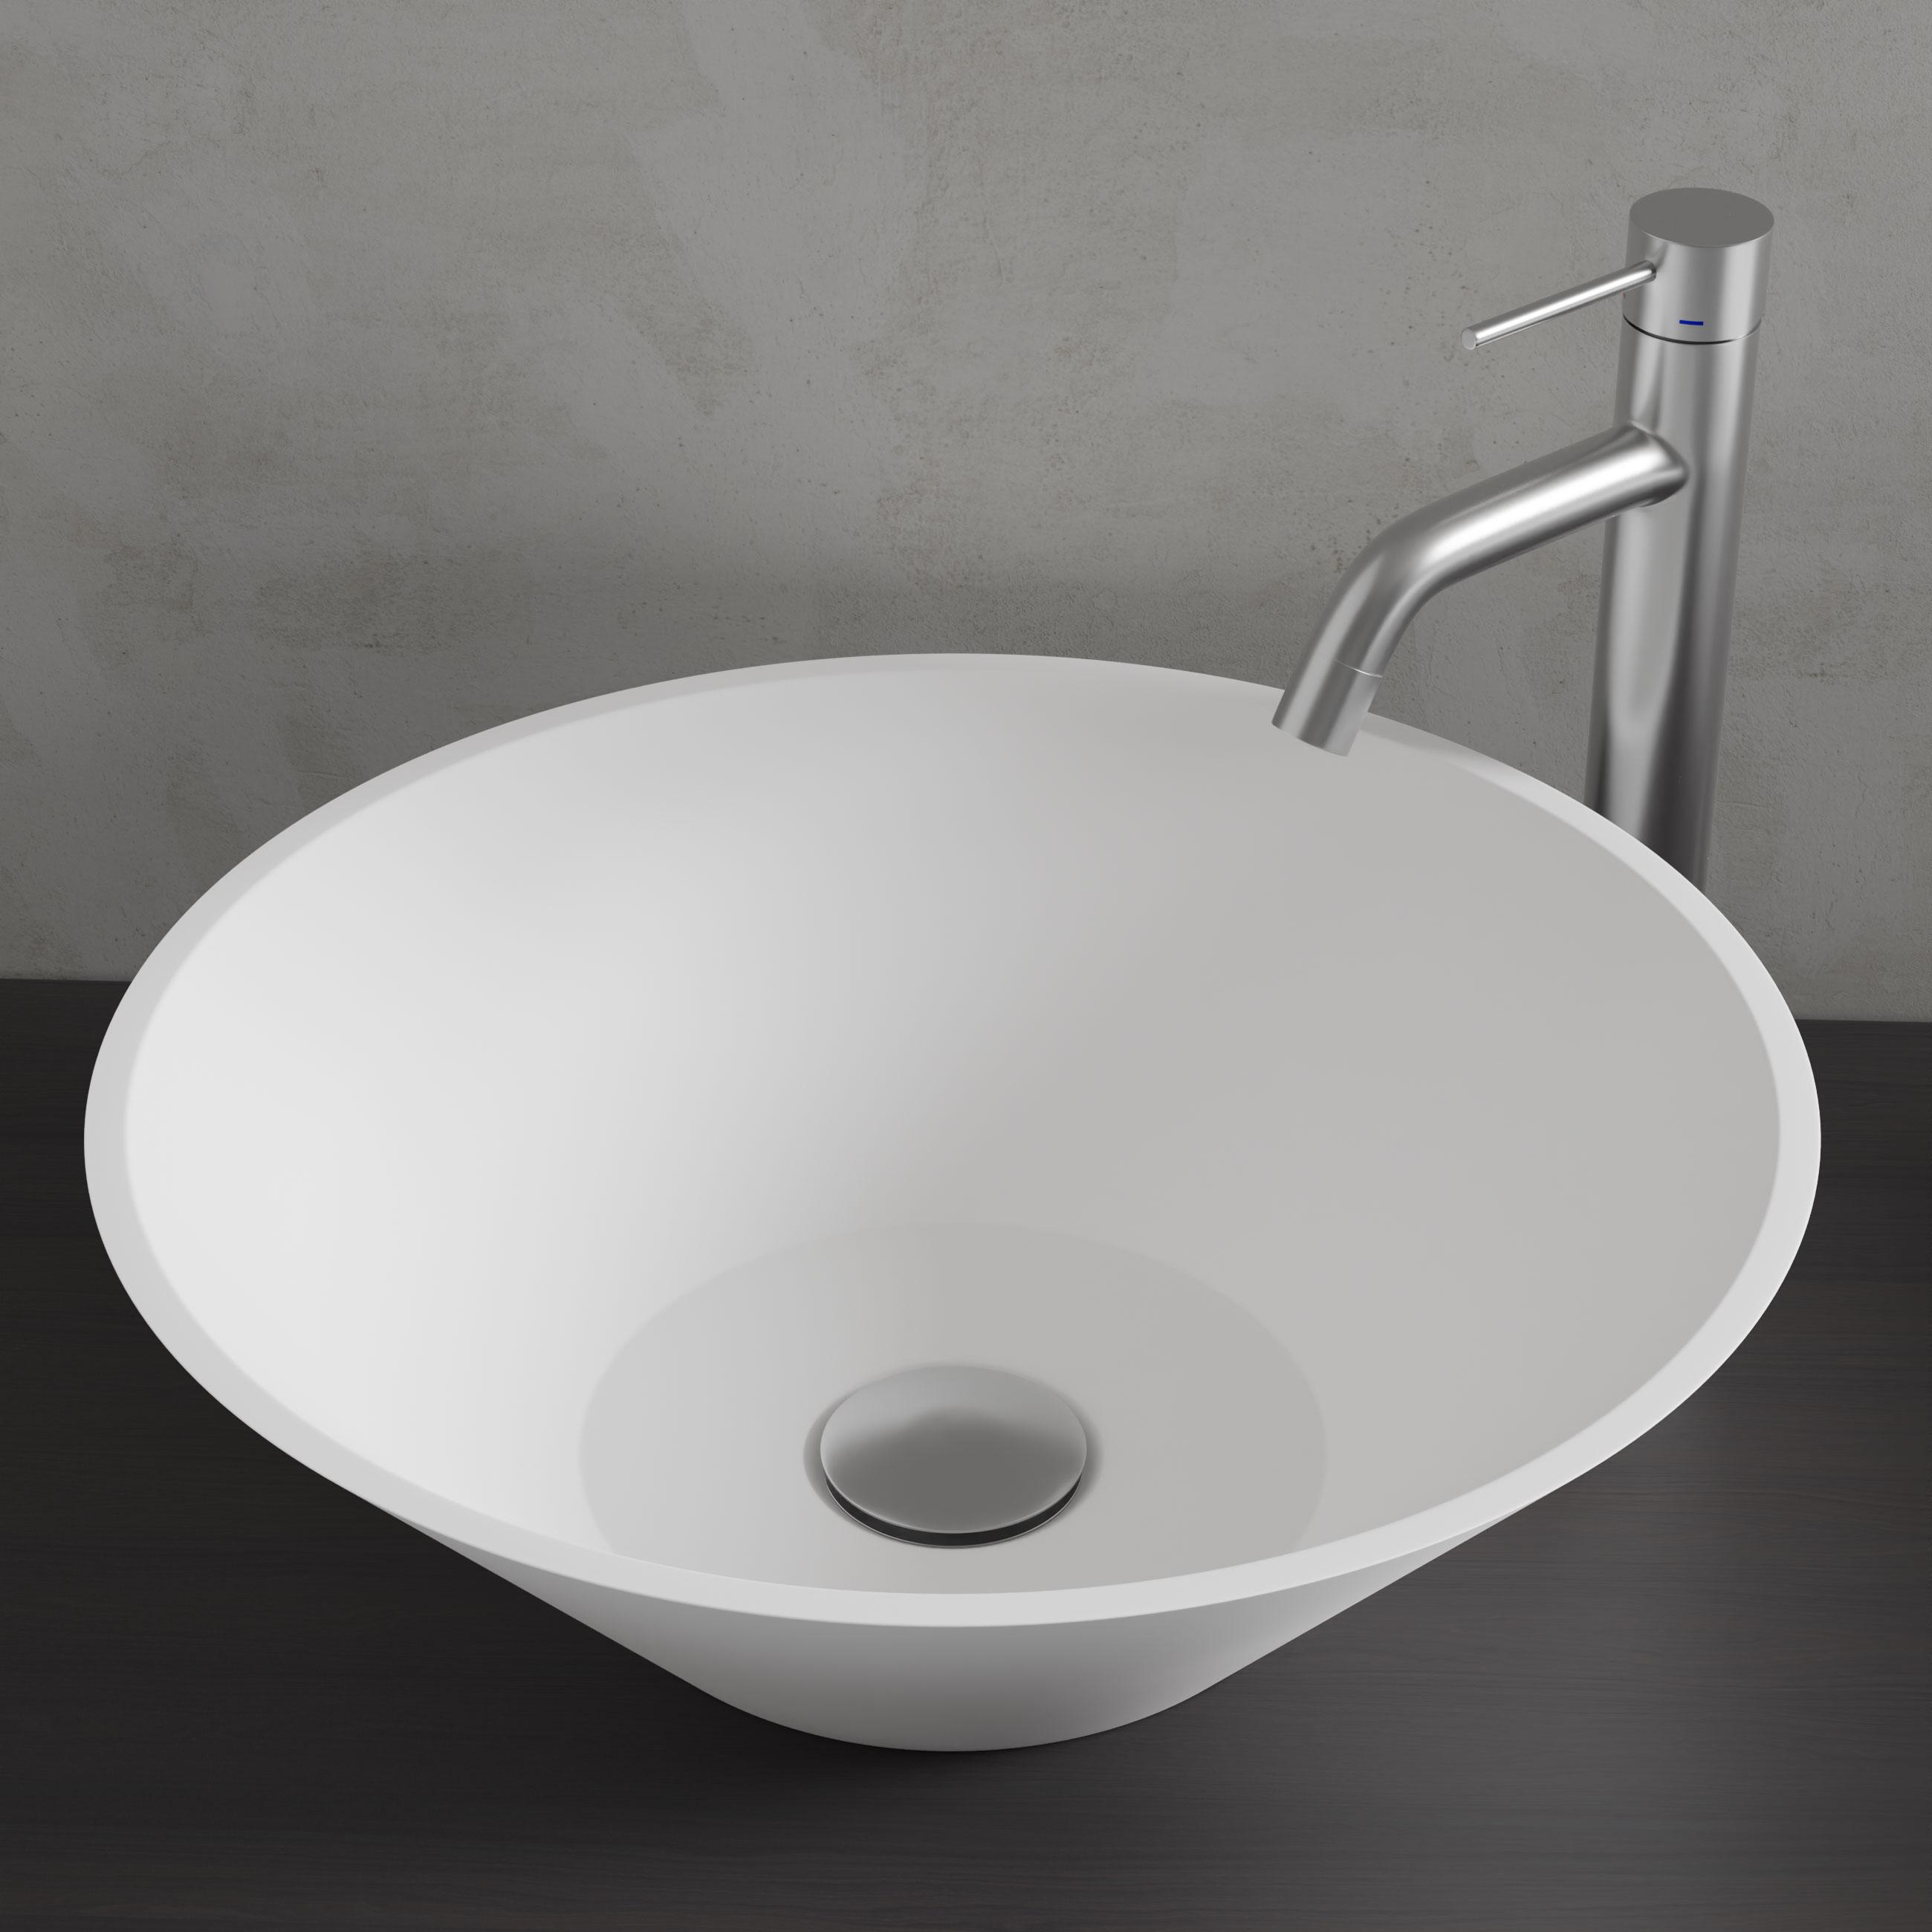 Tvättställ Scandtap Bathroom Concepts Solid R3